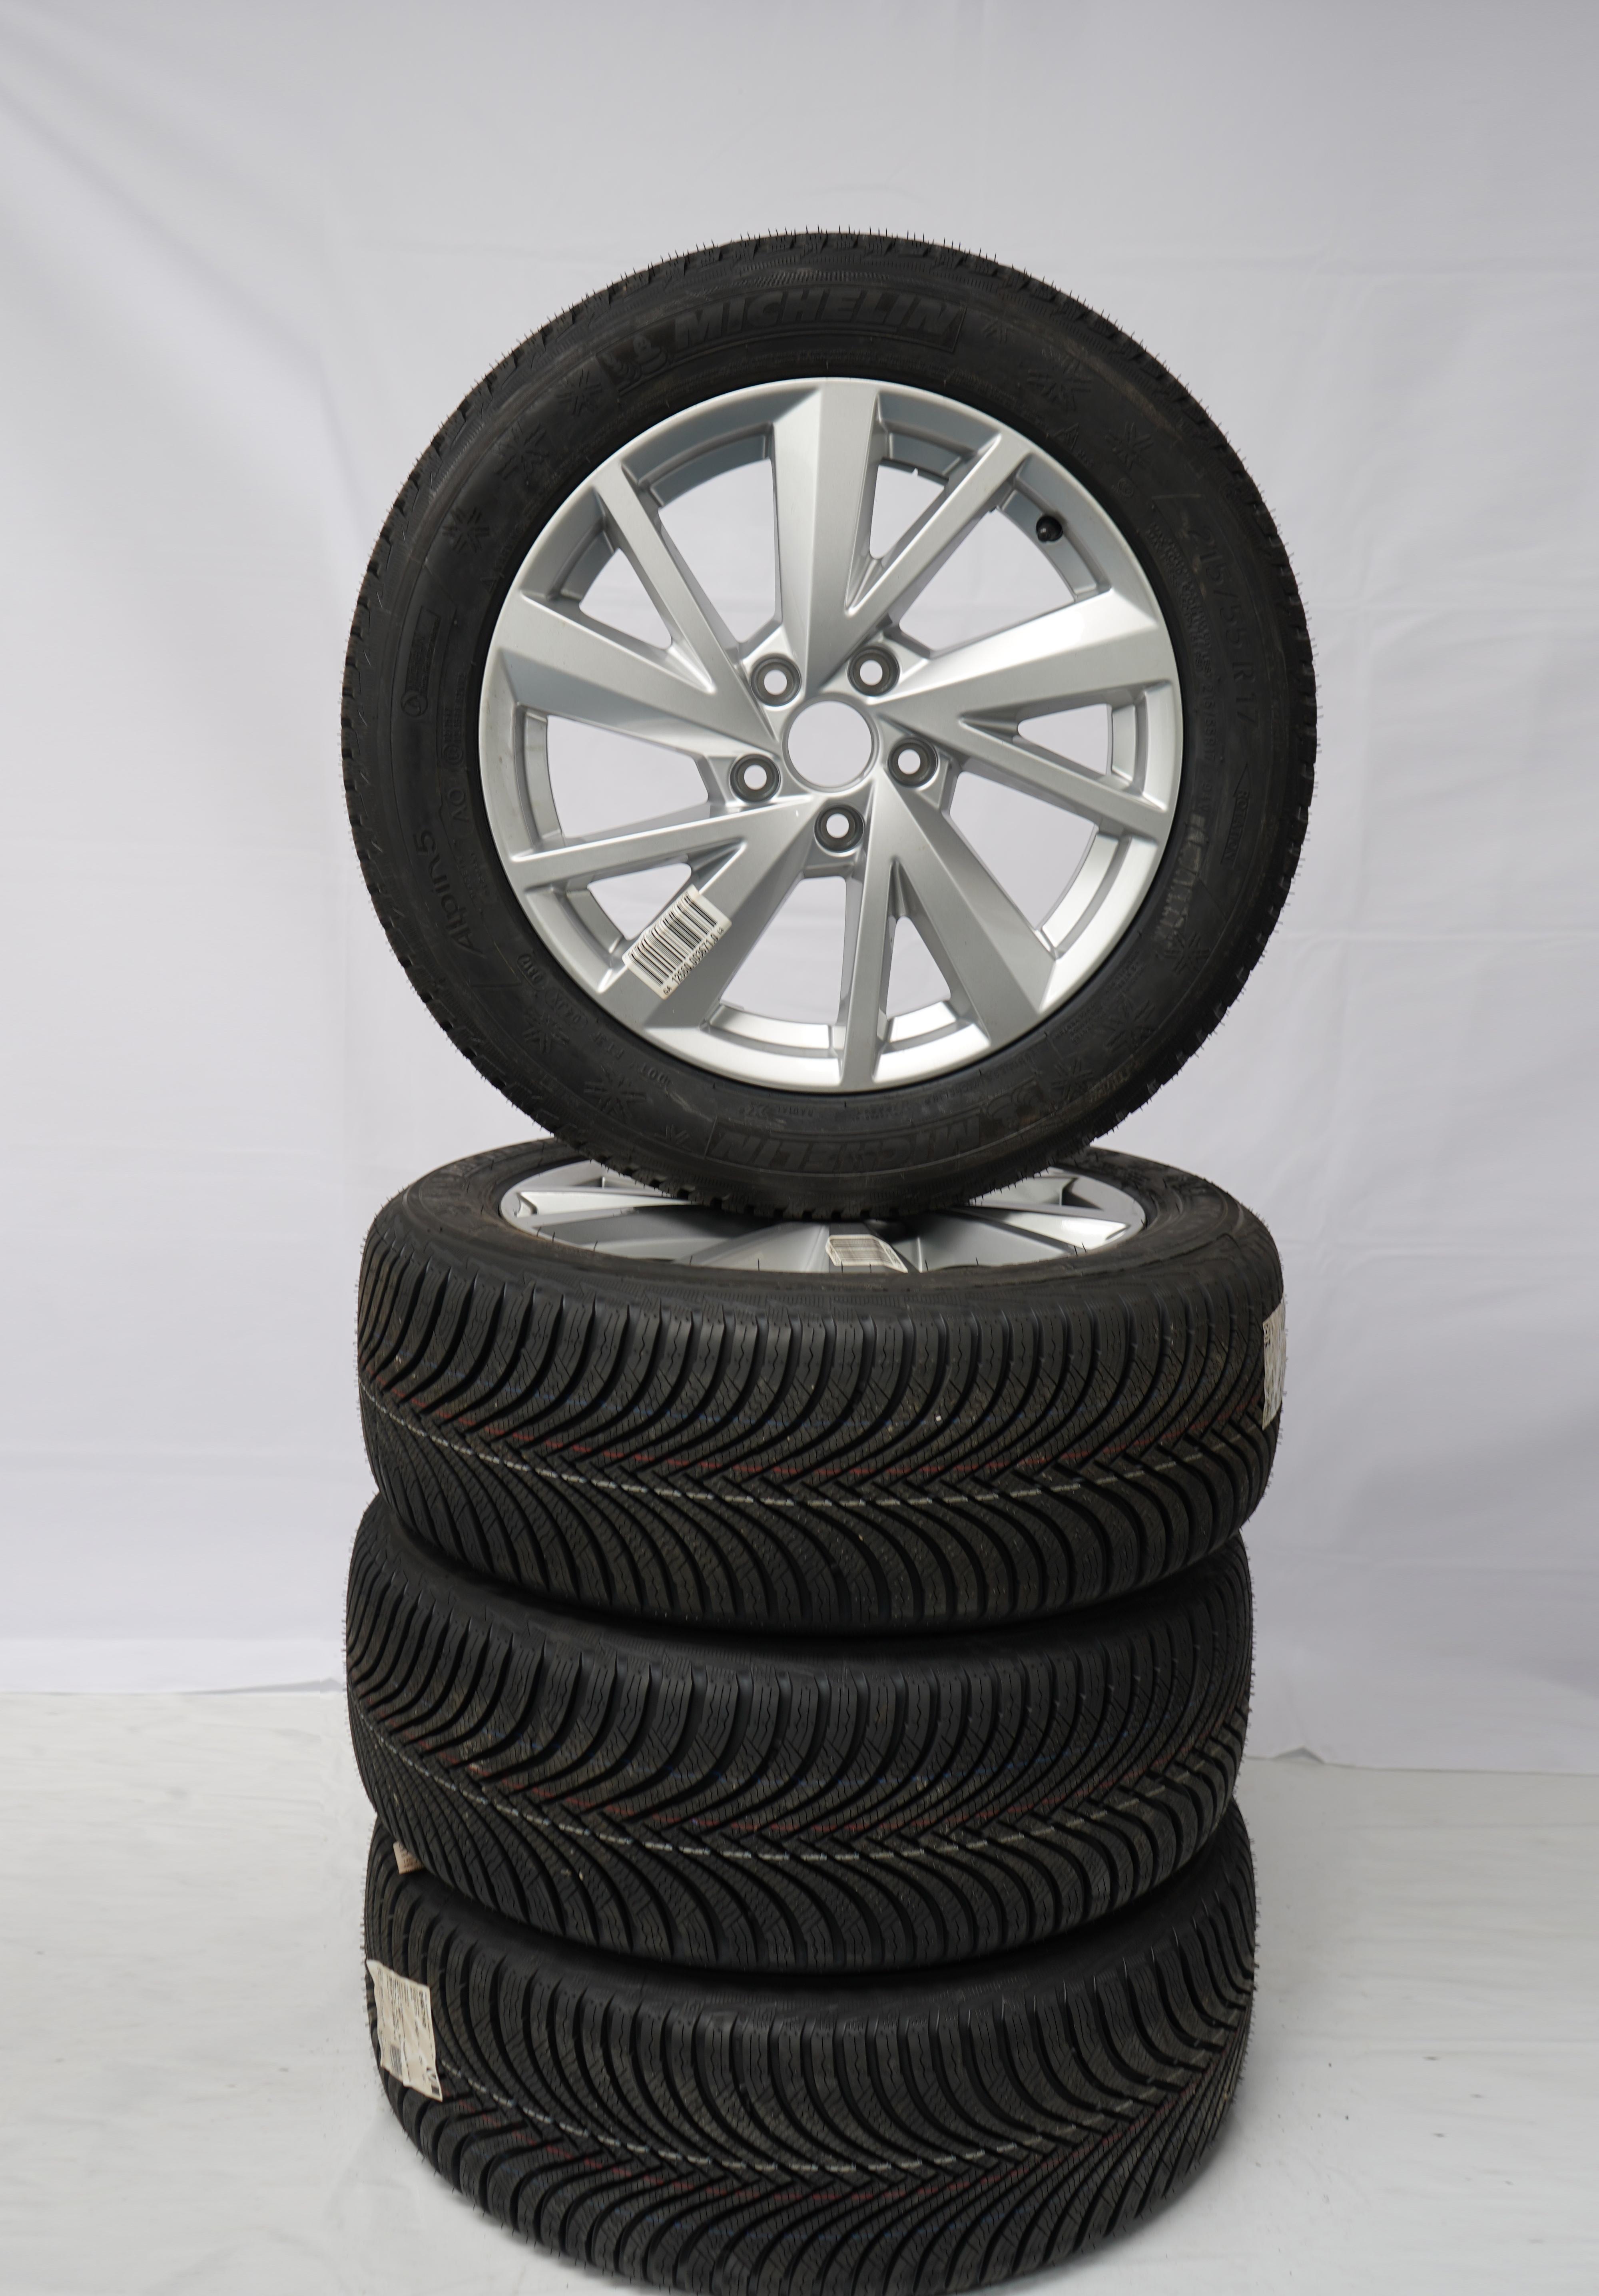 Q2 (GA) Gebrauchter 17 Zoll Original Audi Winterkomplettrad-Satz Michelin